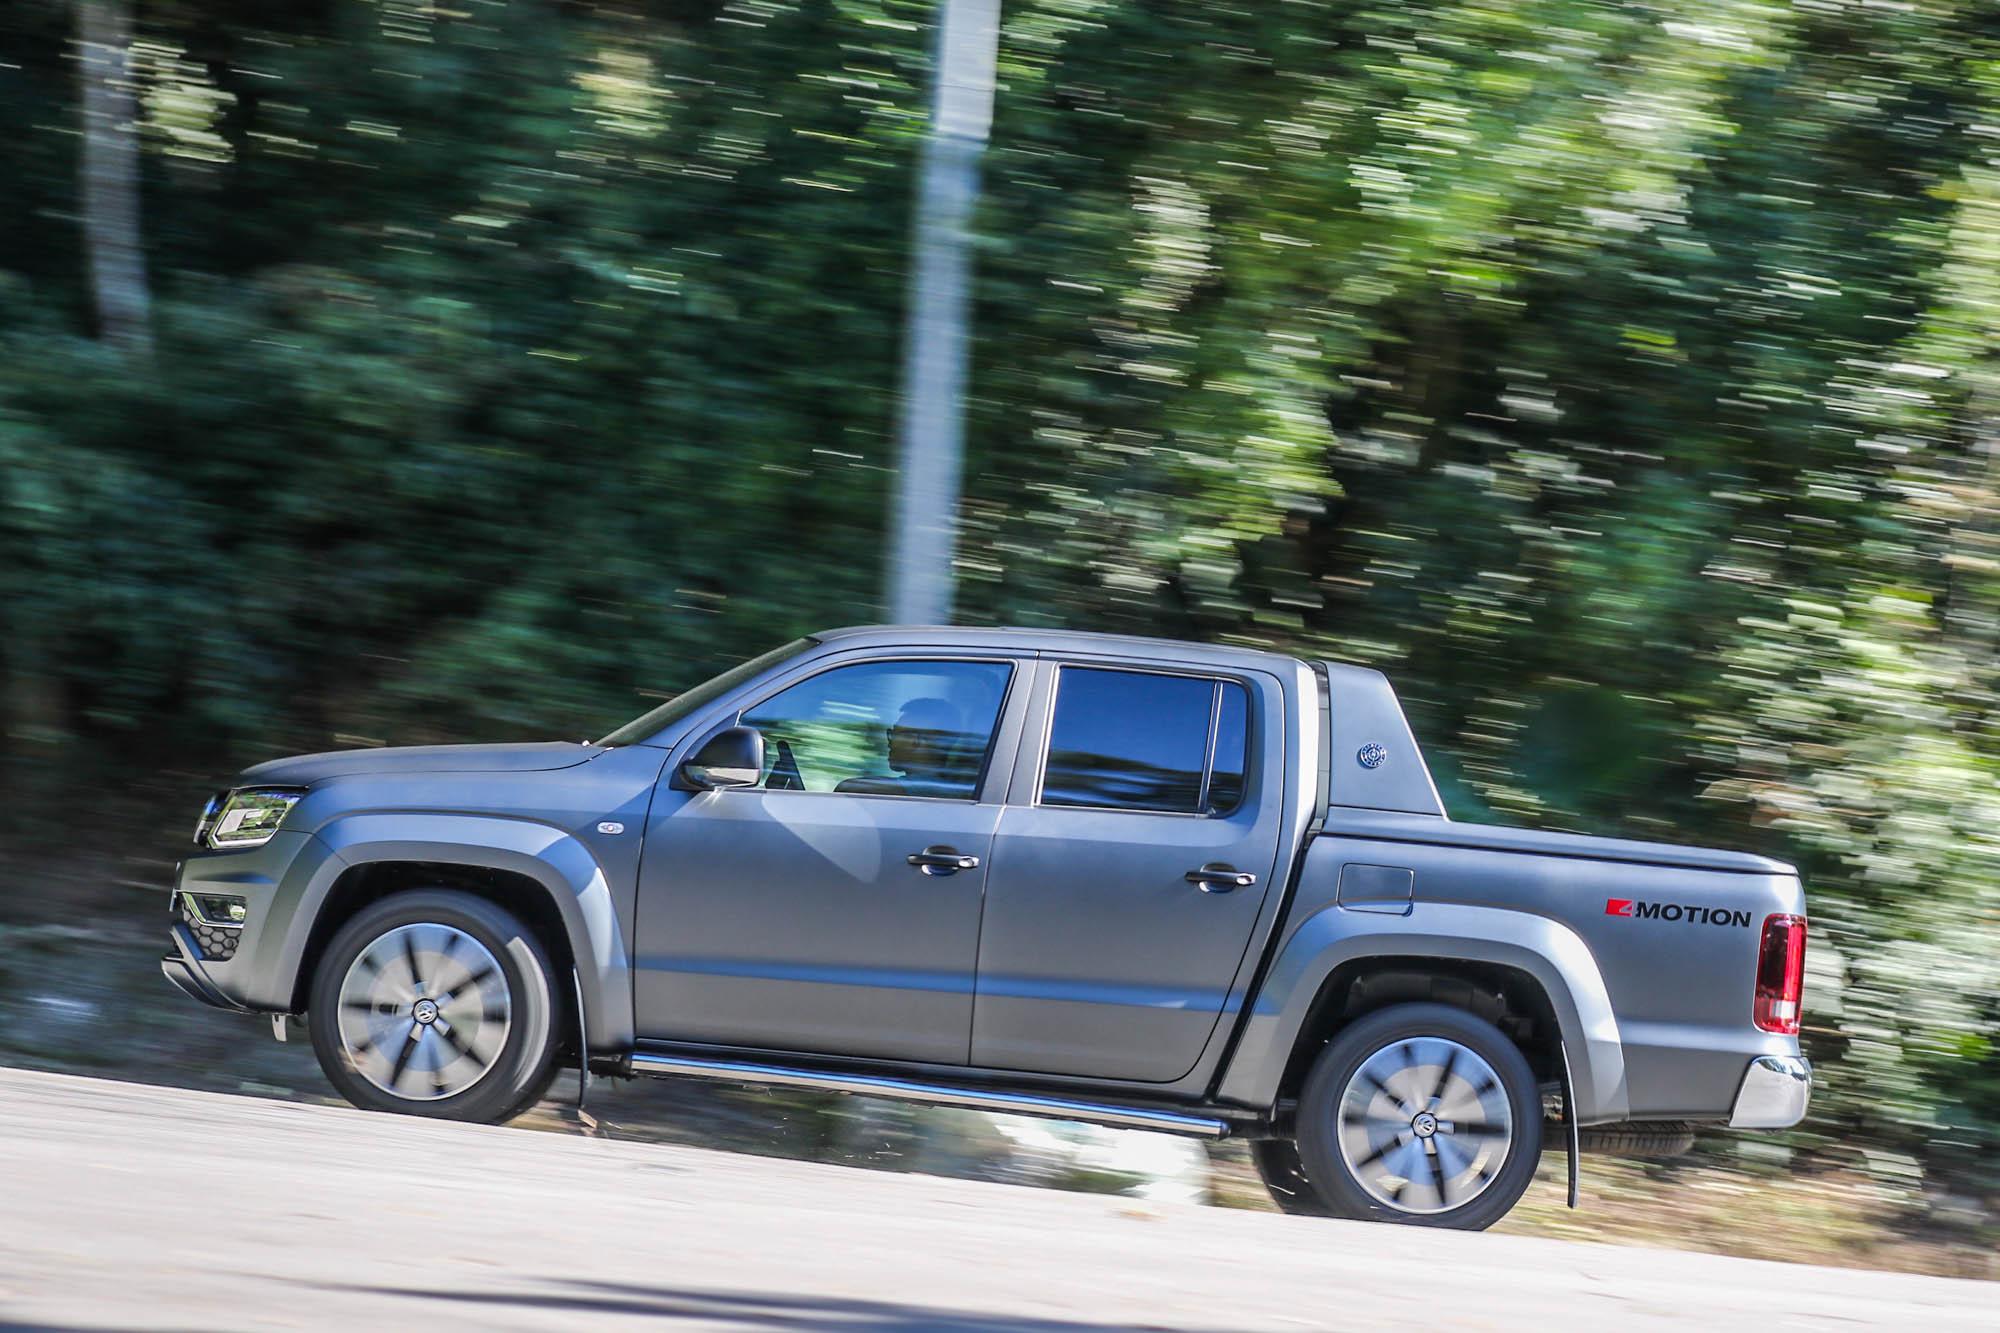 0-100km/h 加速七秒台的實力,在一般道路上的行駛更增添樂趣。